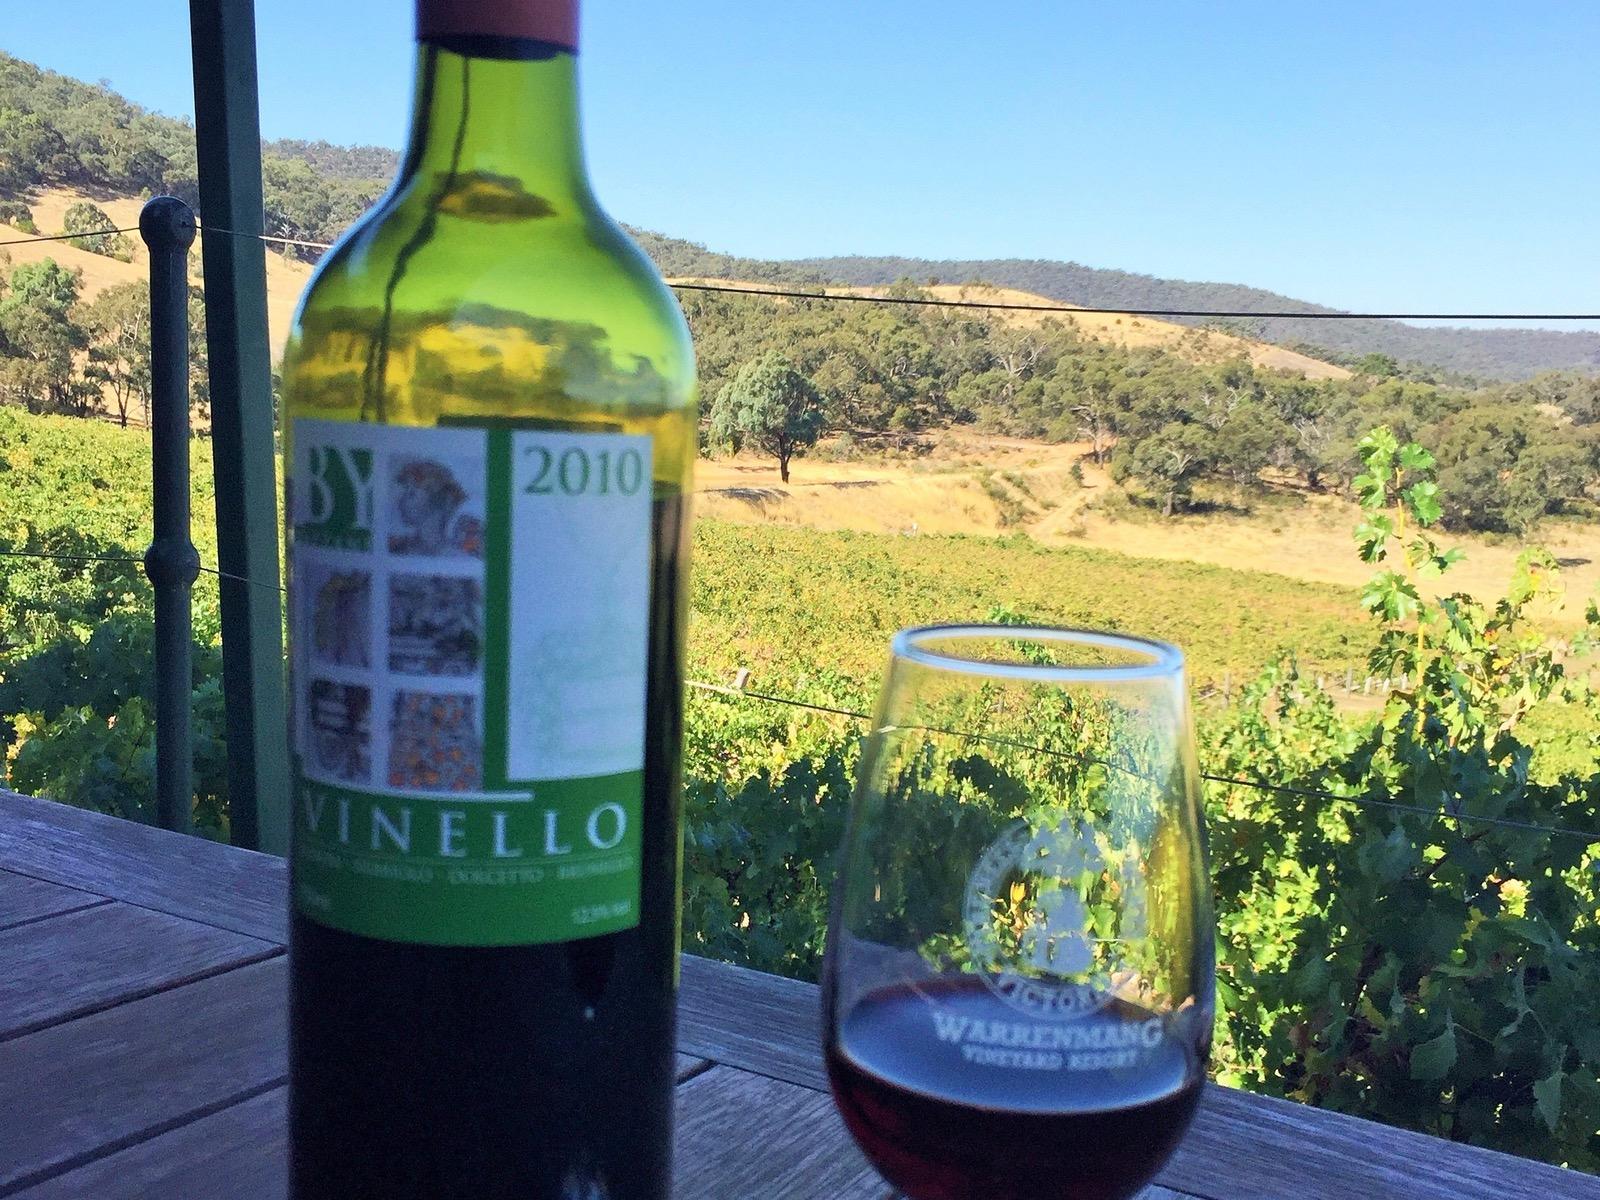 Vinello wine enjoyed on the deck